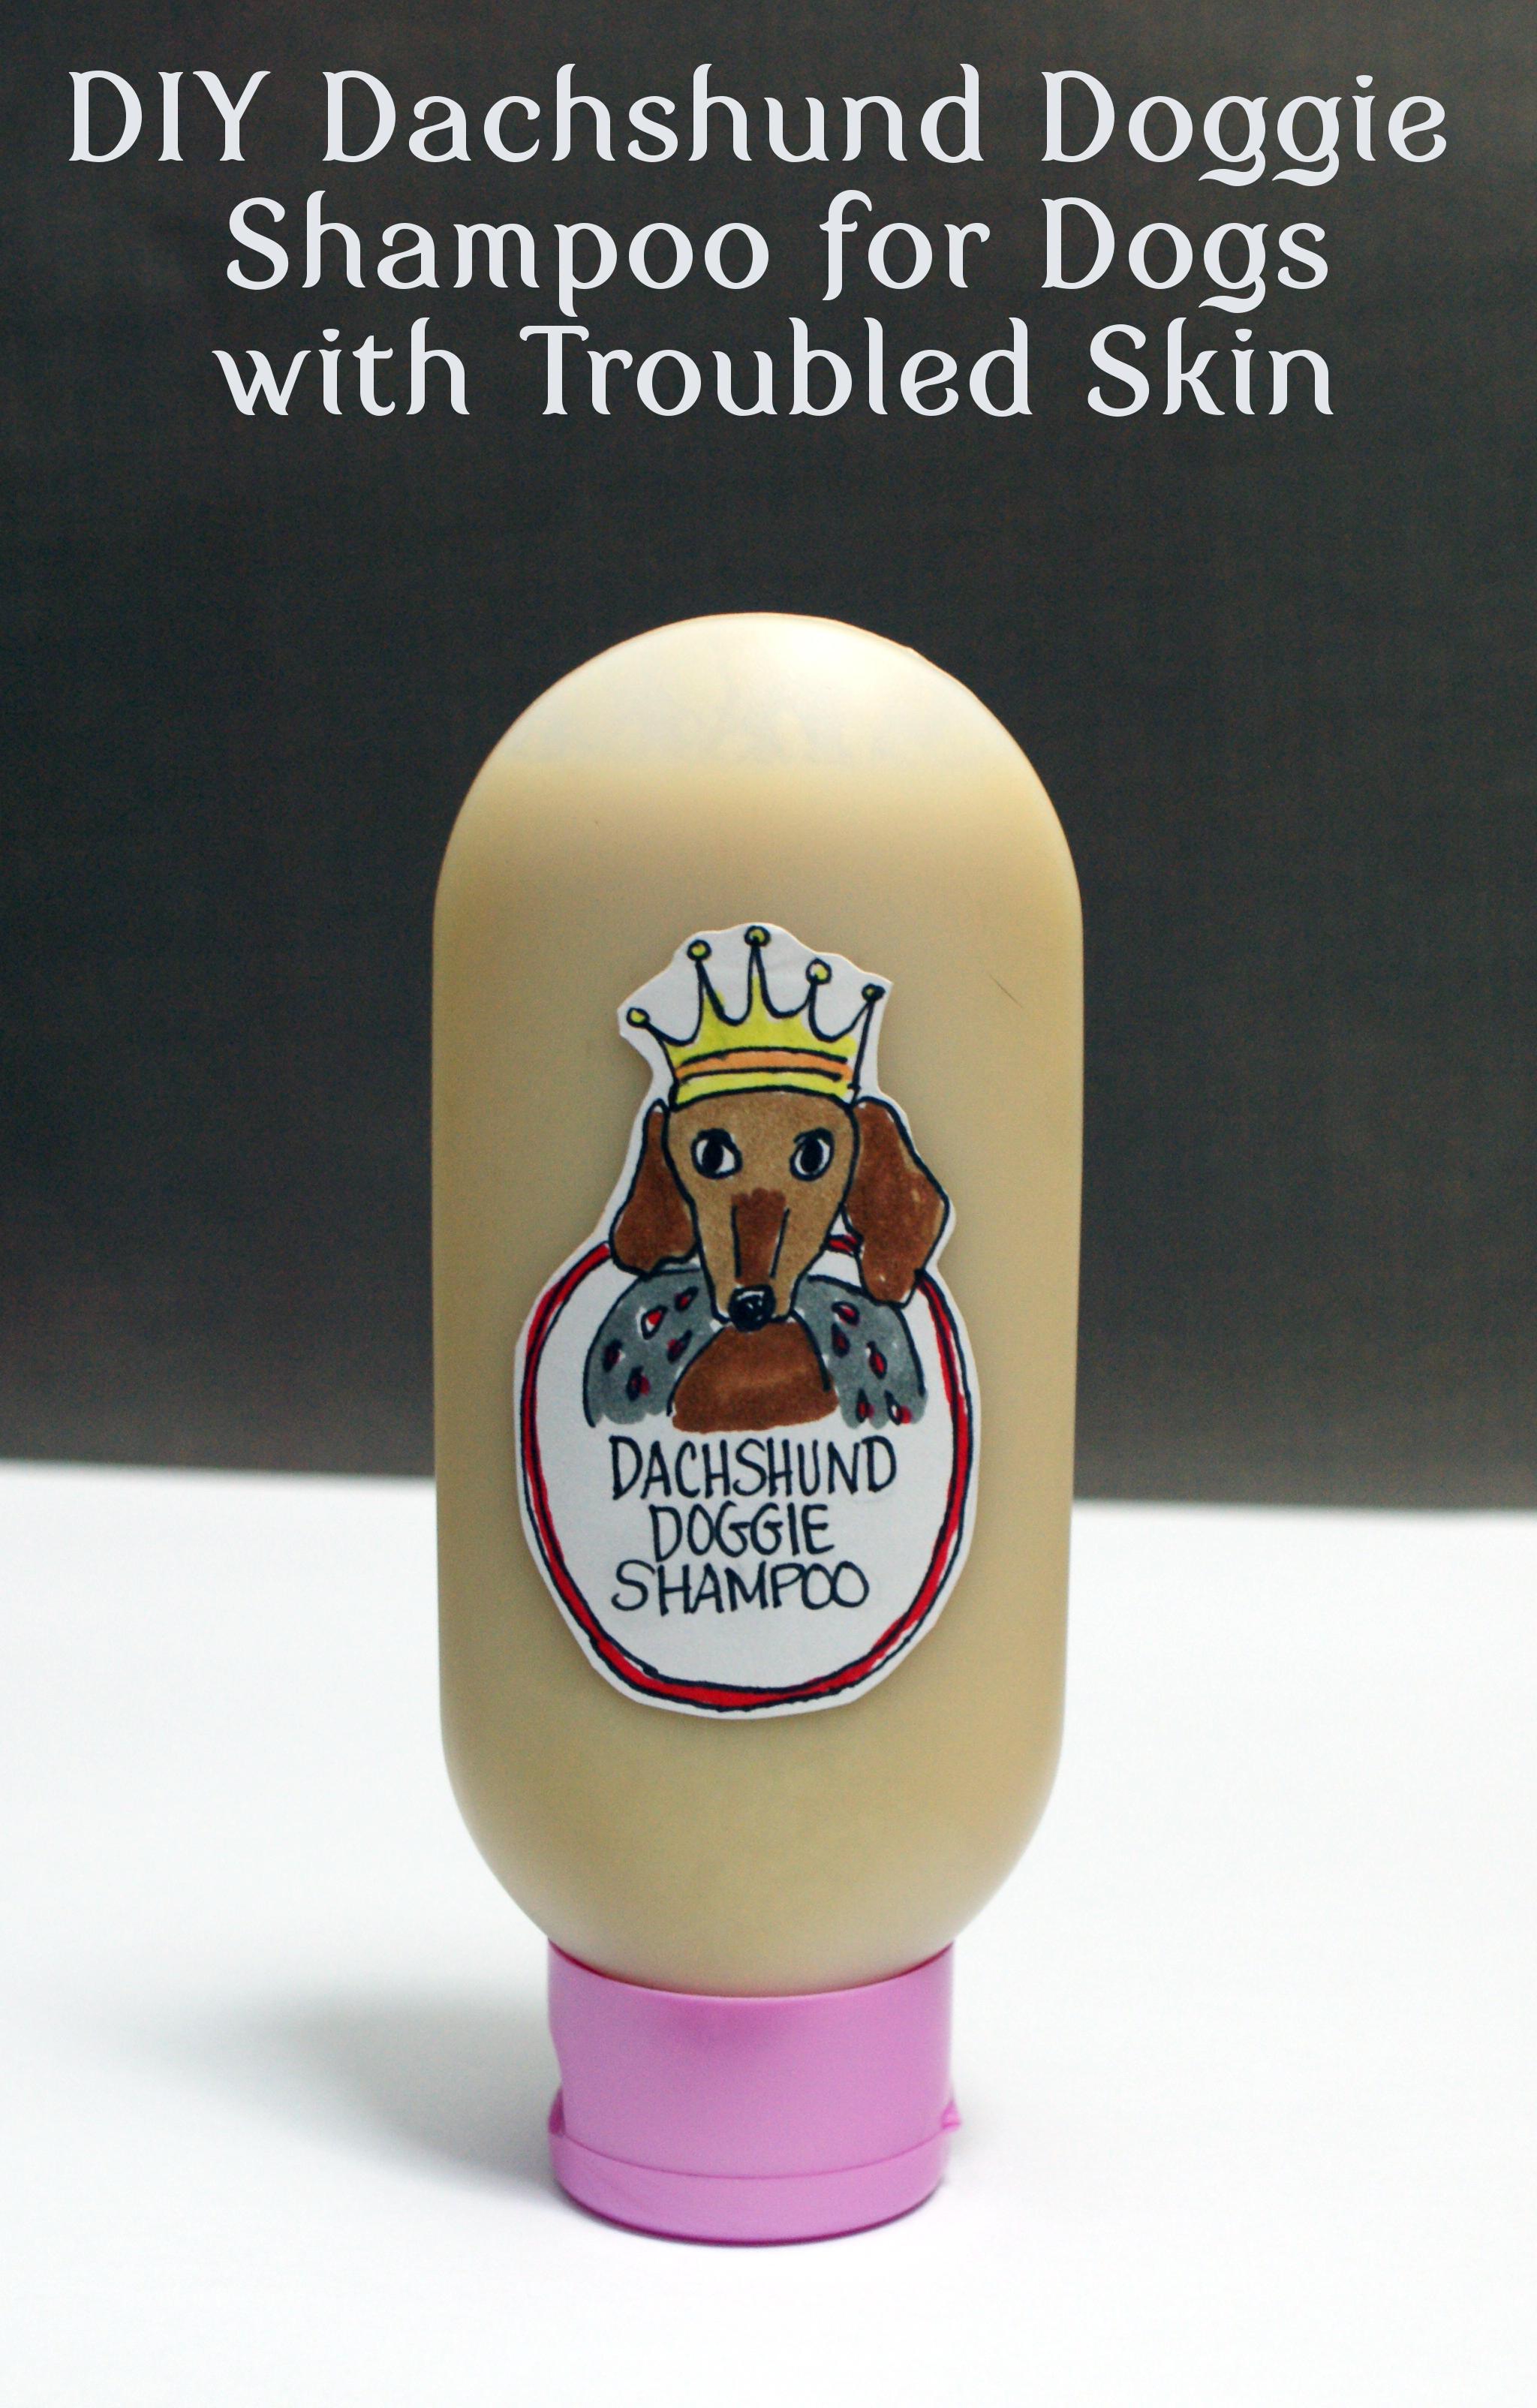 DIY Dog Shampoo  Homemade Dog Shampoo Recipe with Neem Oil for Dogs with